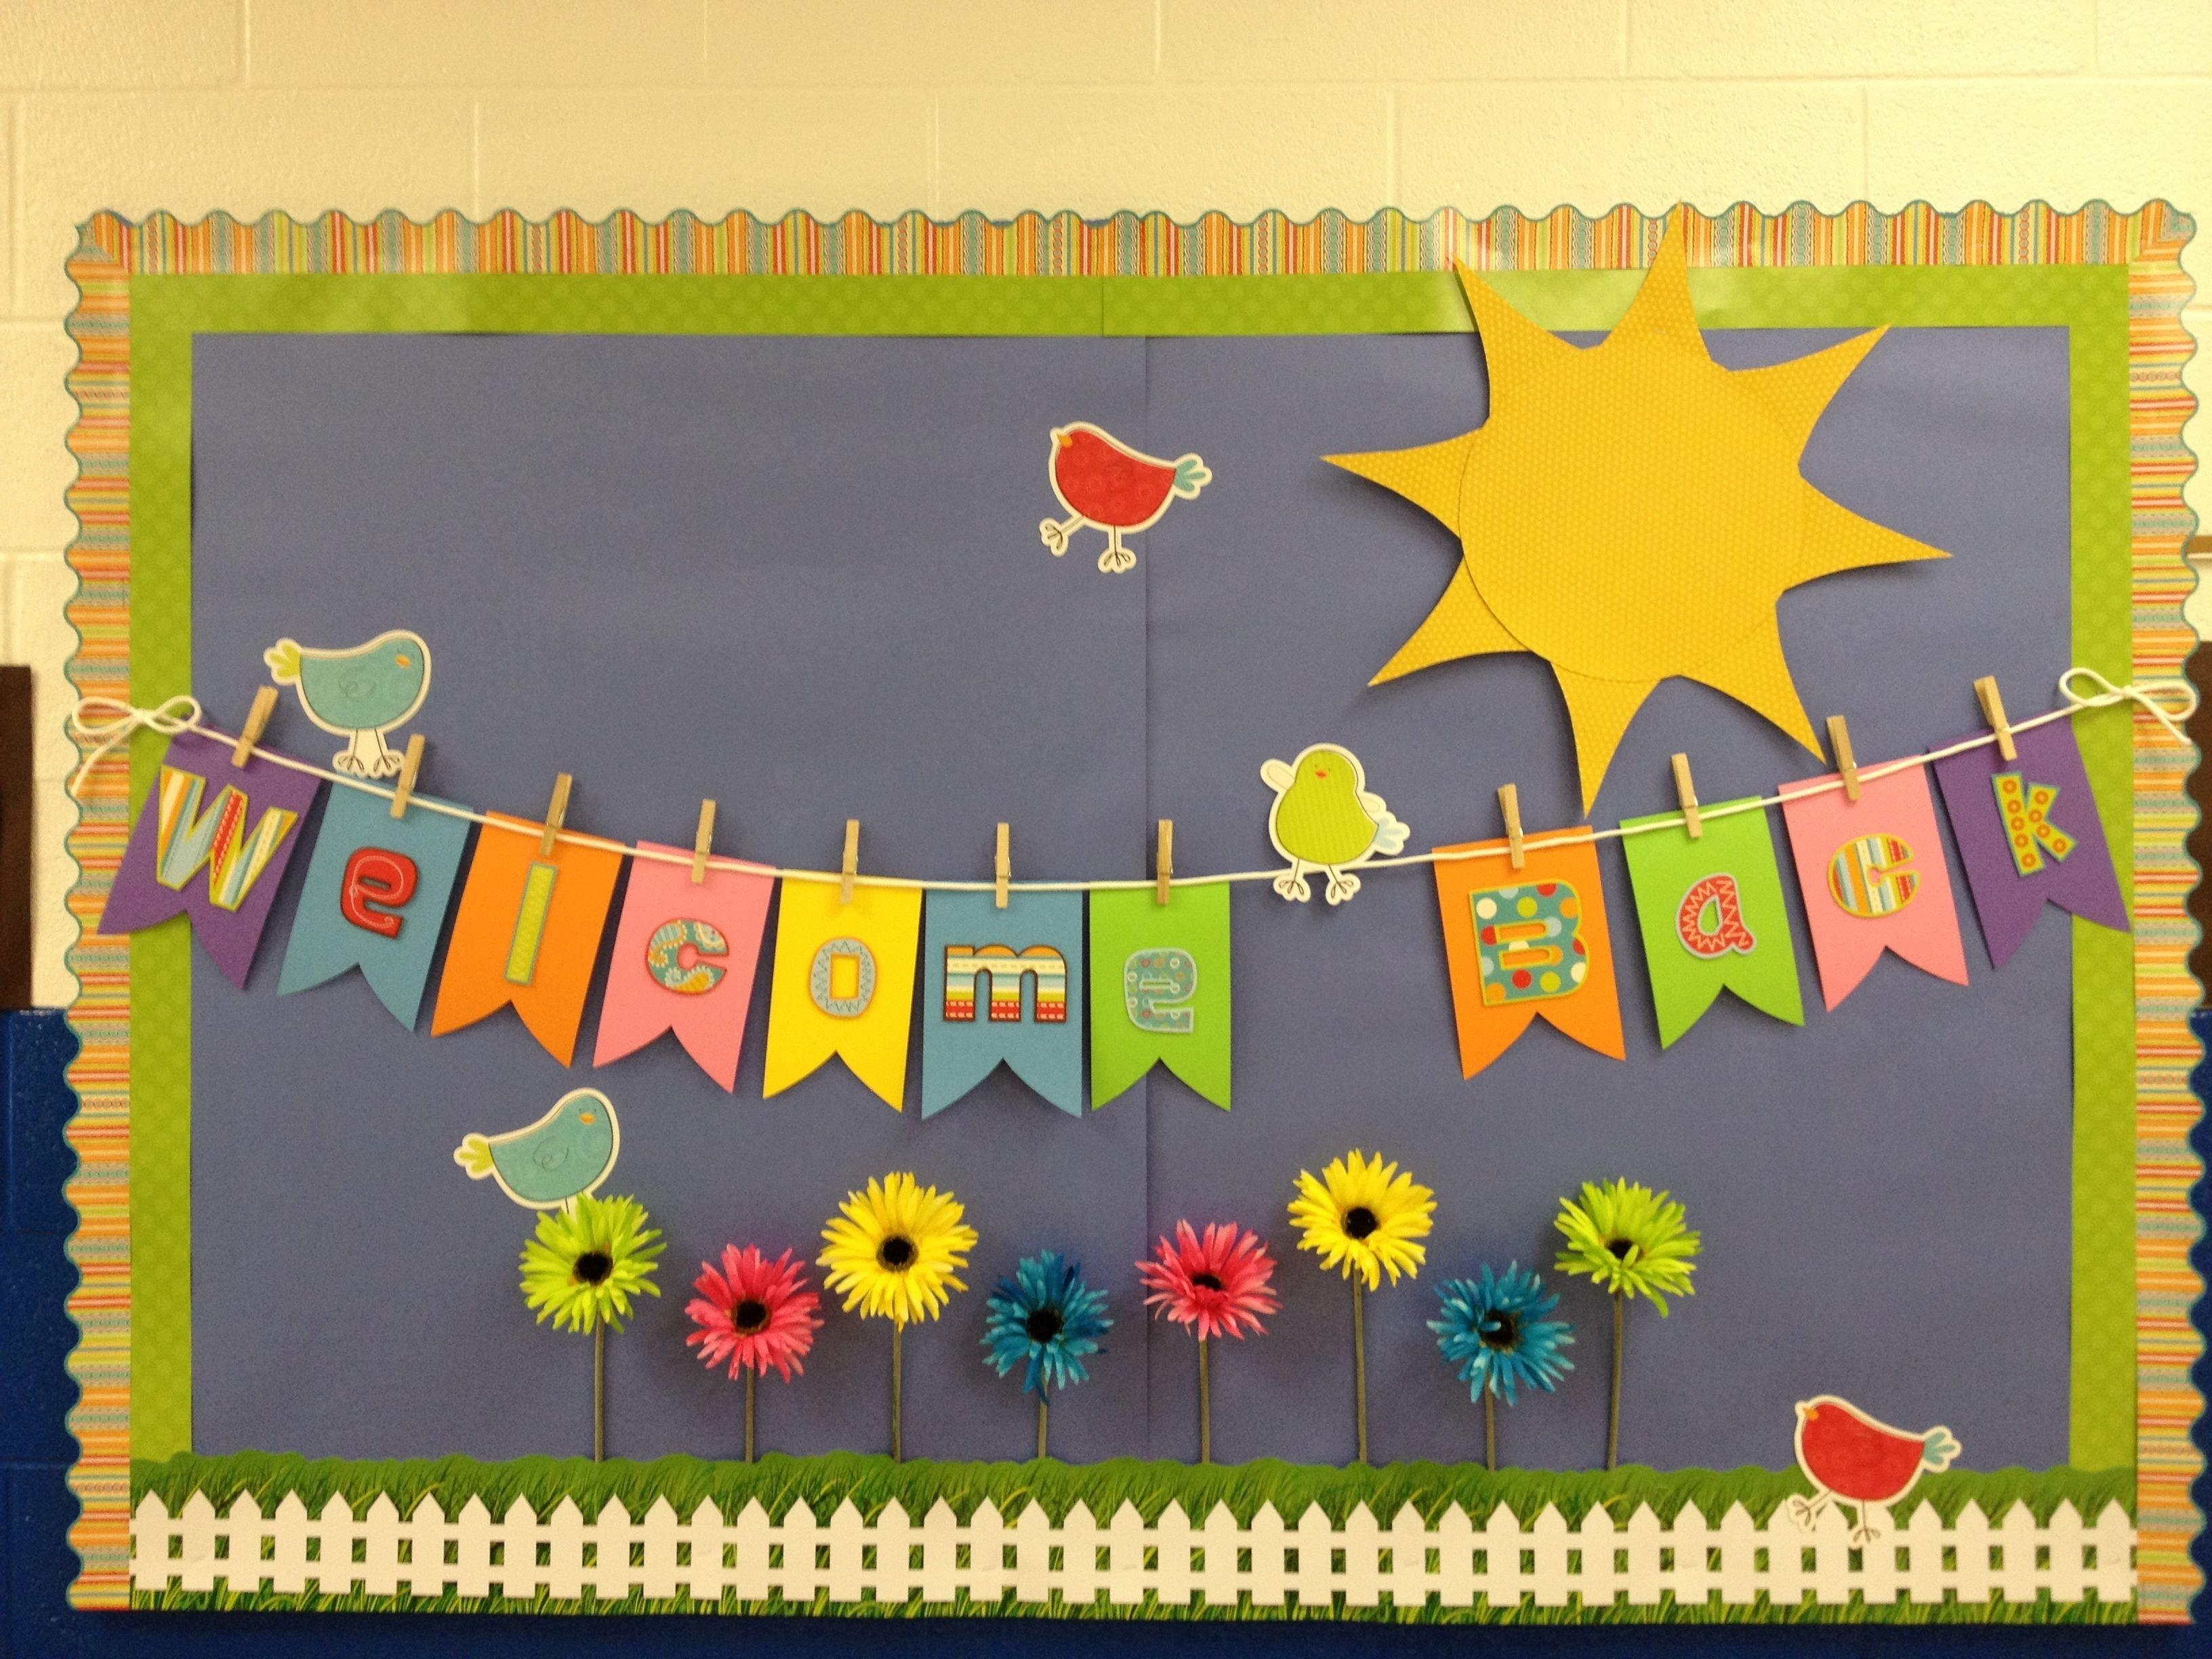 10 Elegant Bulletin Board Ideas For Back To School spring theme welcome back to school bulletin boards ideas bing 1 2021